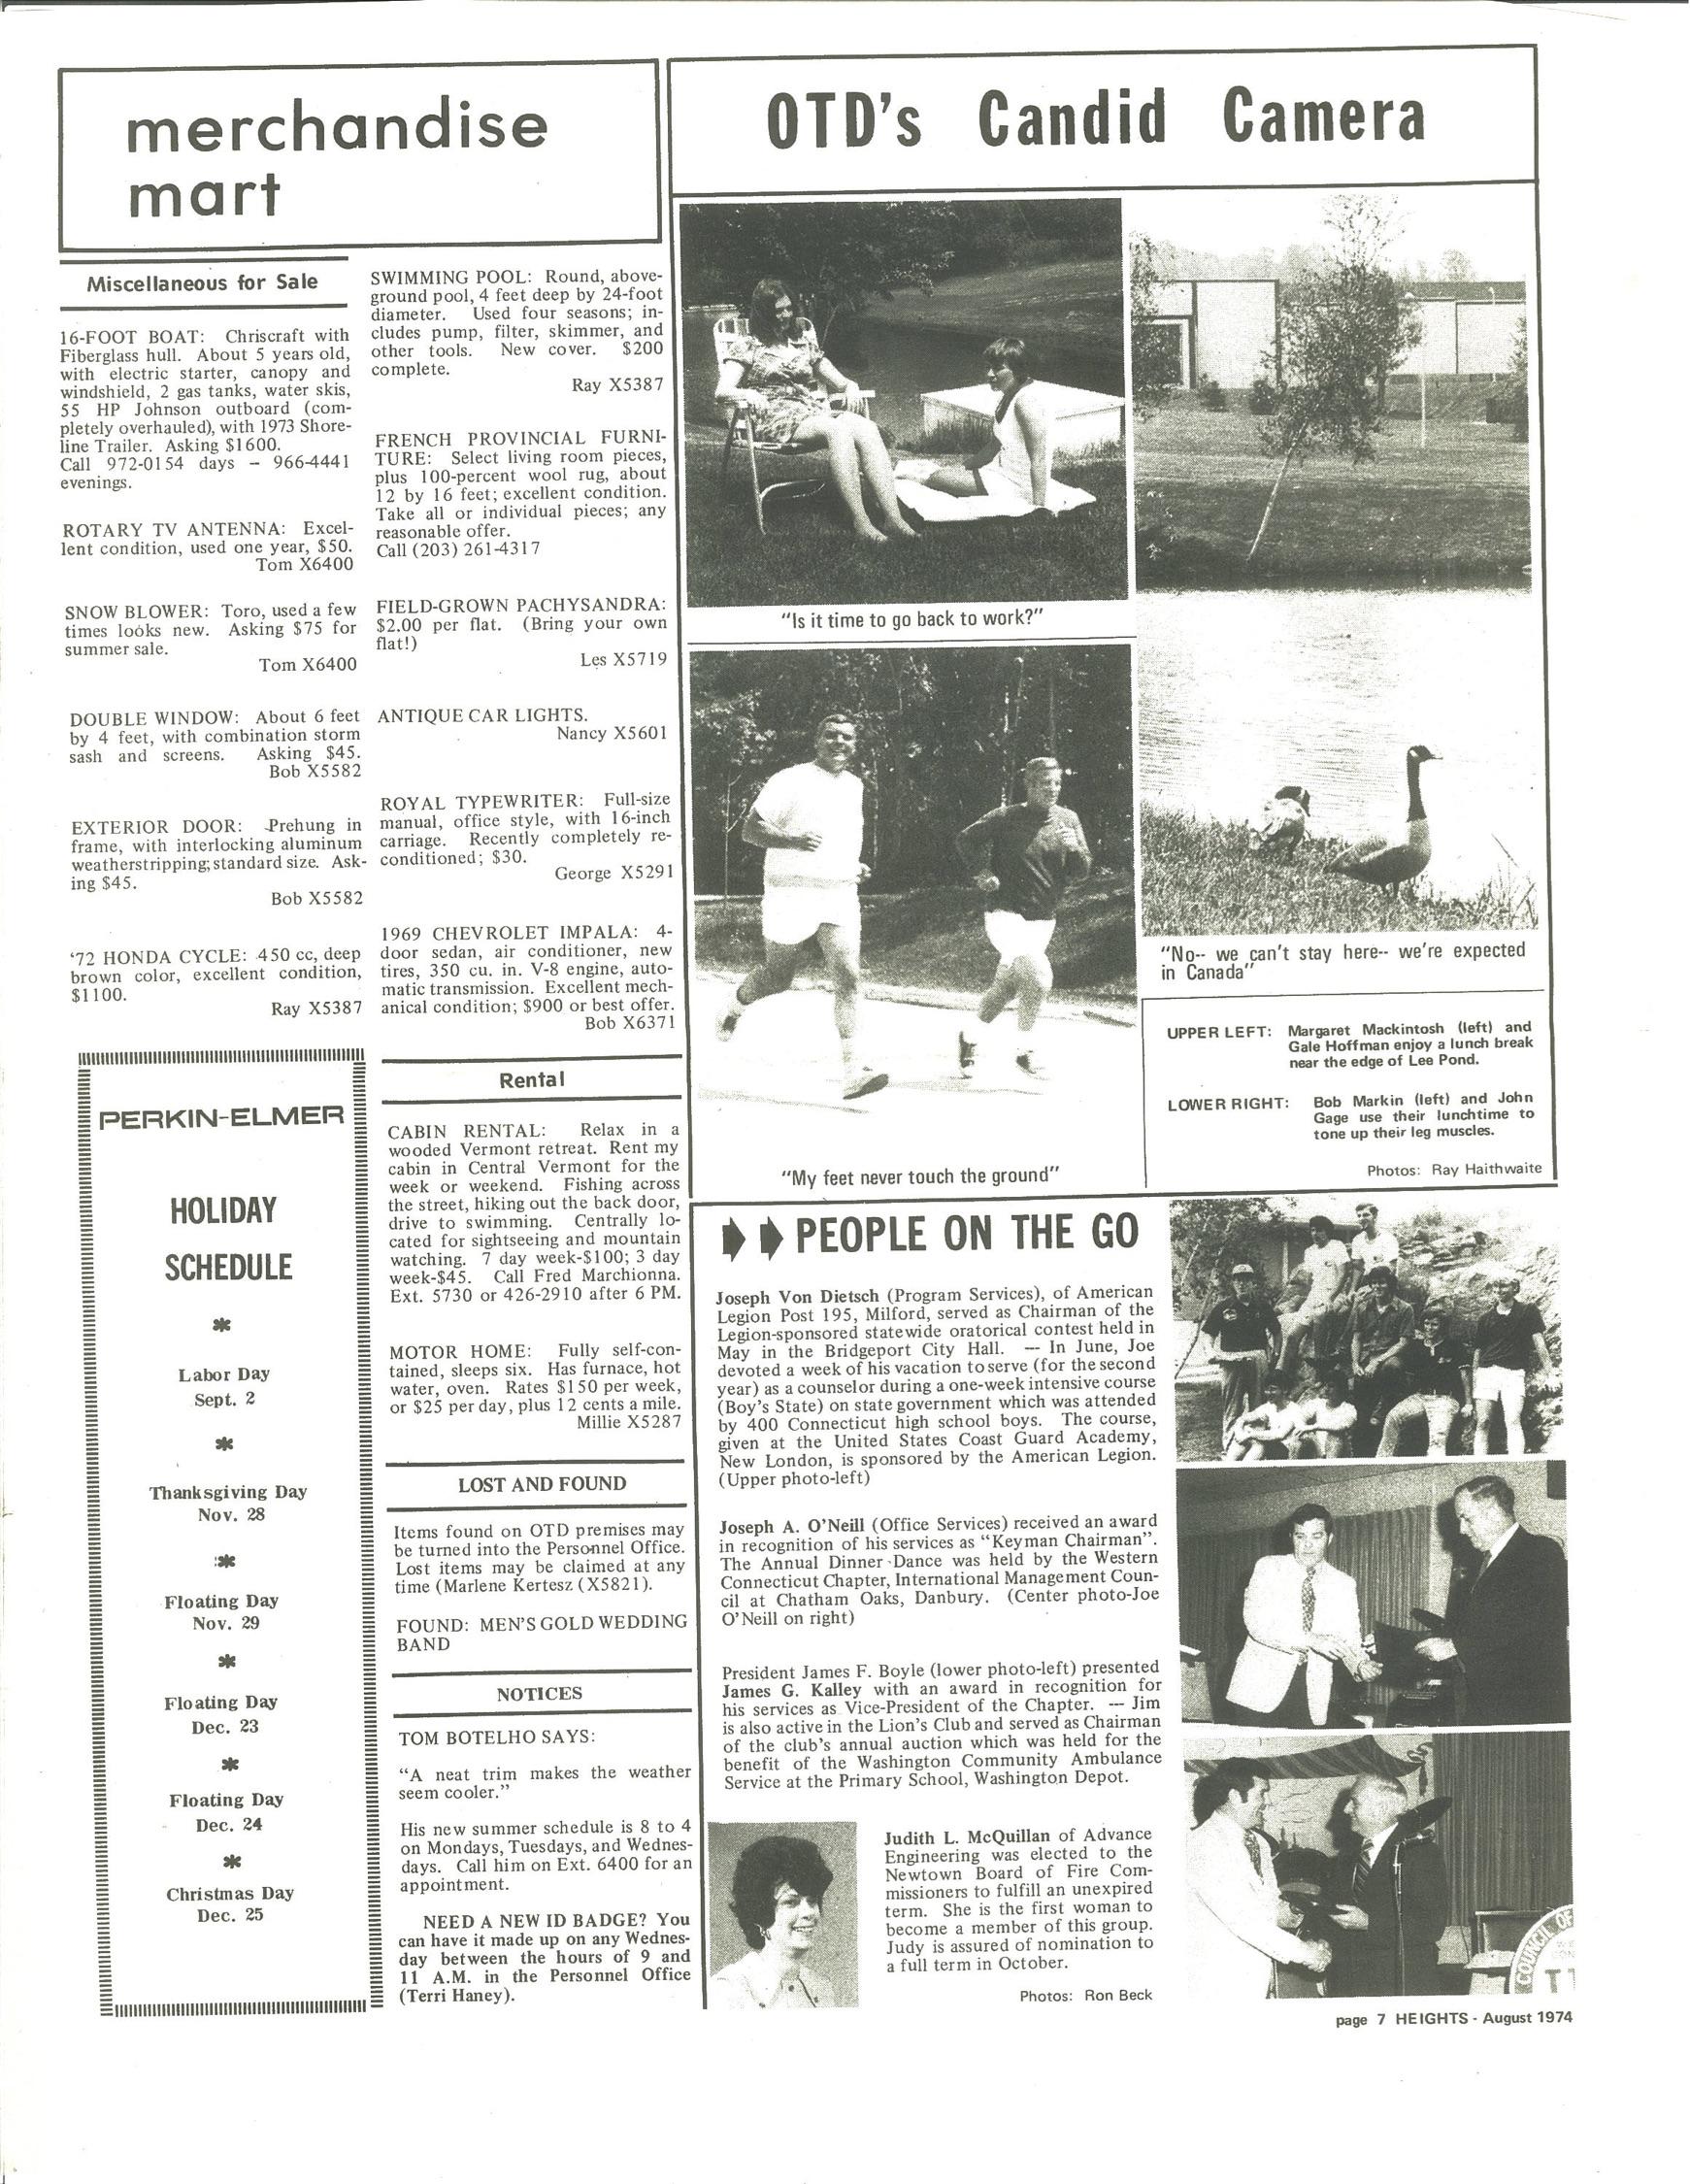 vol 7 num 3 page 7.jpg